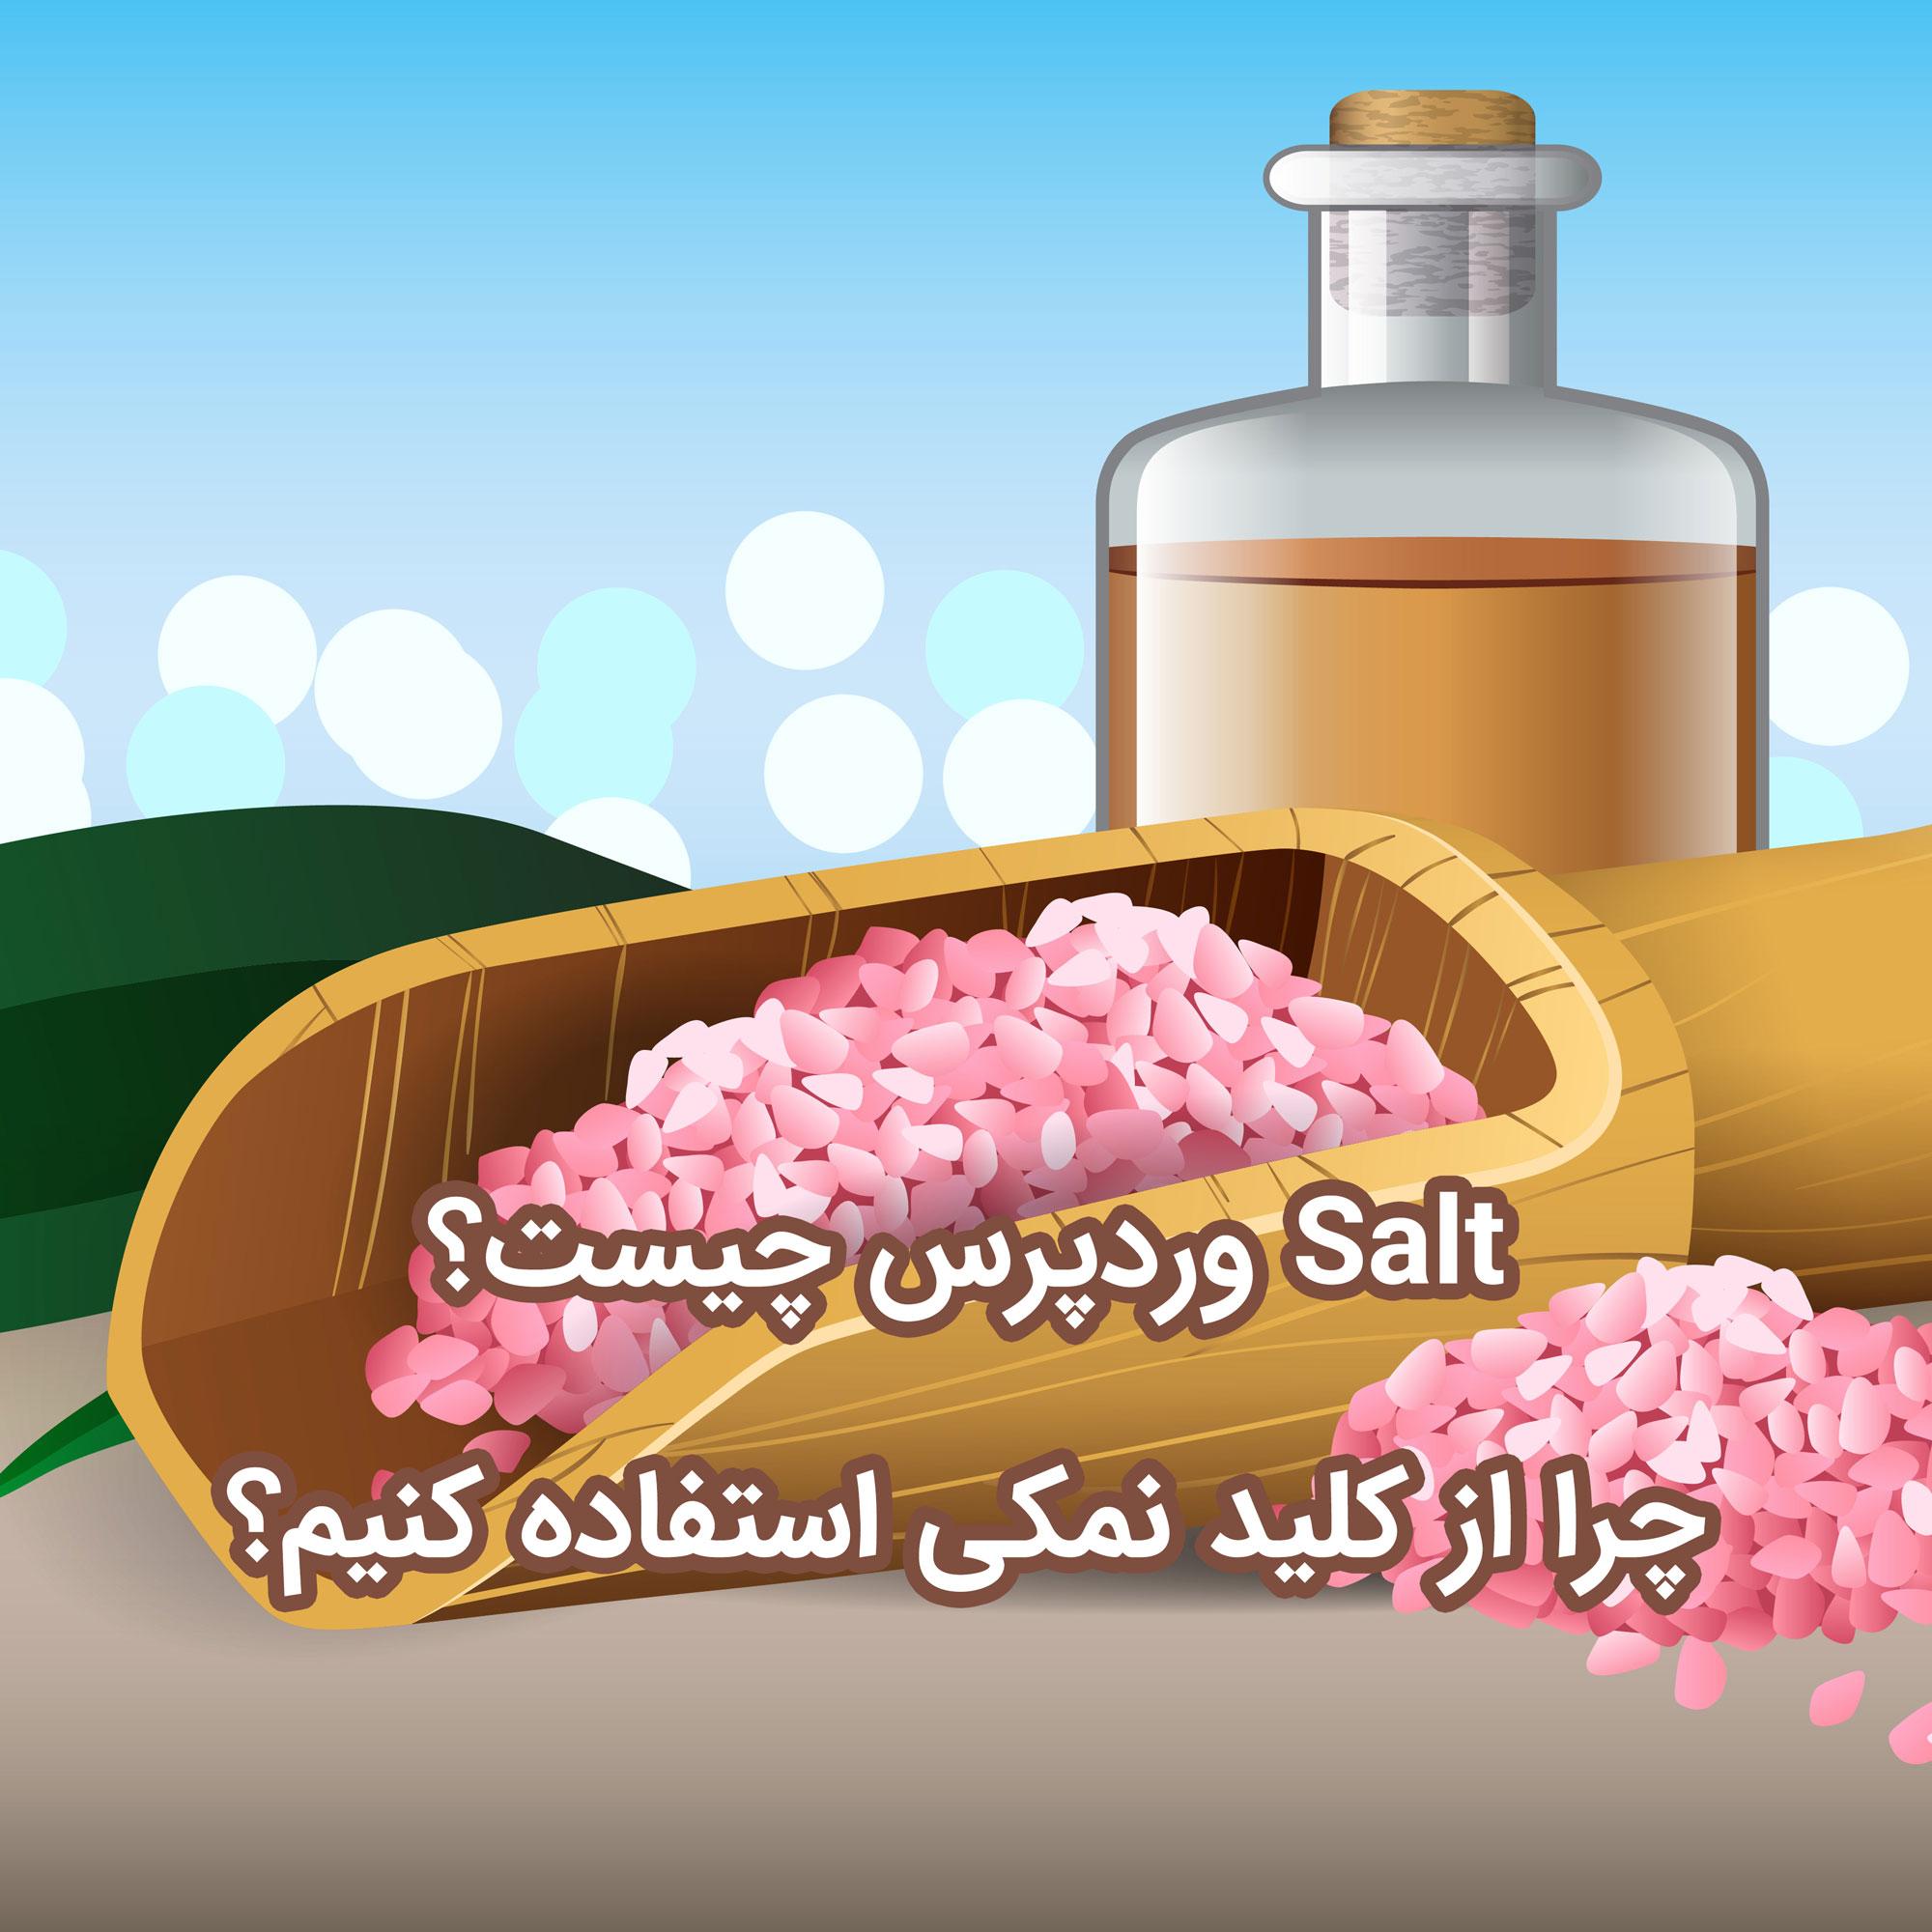 Salt وردپرس چیست؟ چرا از کلید نمک استفاده کنیم؟